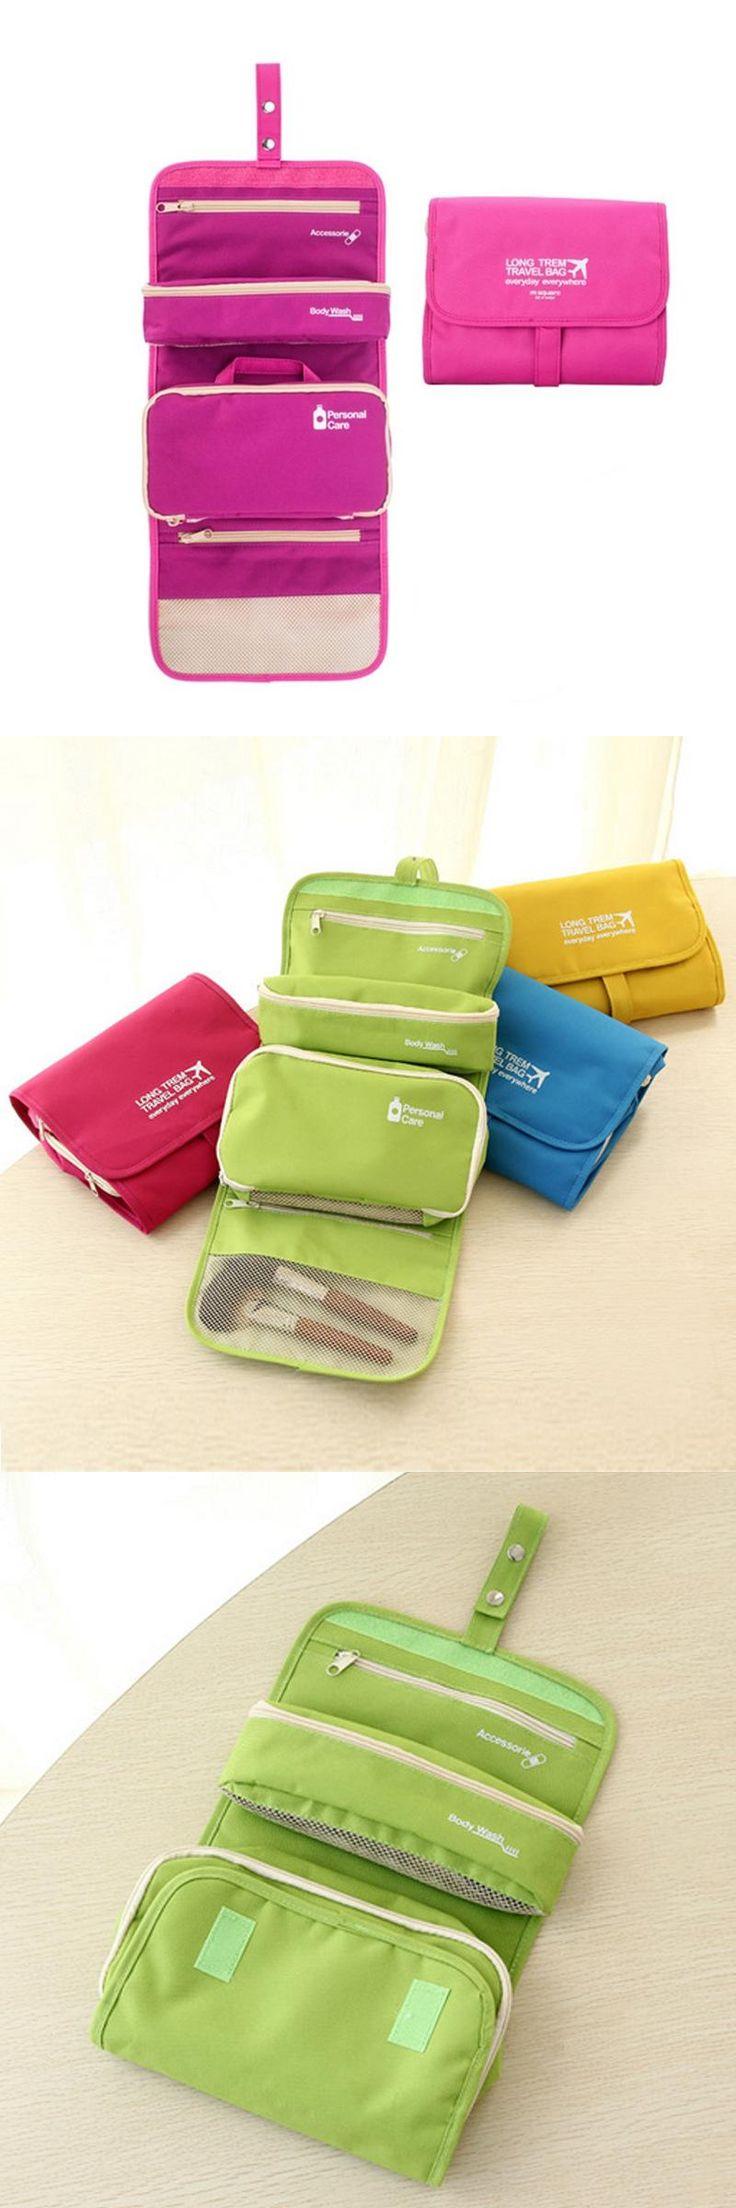 [Visit to Buy] M Square Beautician Travel Cosmetic Bag Organizer Toiletry Makeup Bag Organizador Wash Make Up Bag Bolsa Neceser Maquillaje Case #Advertisement